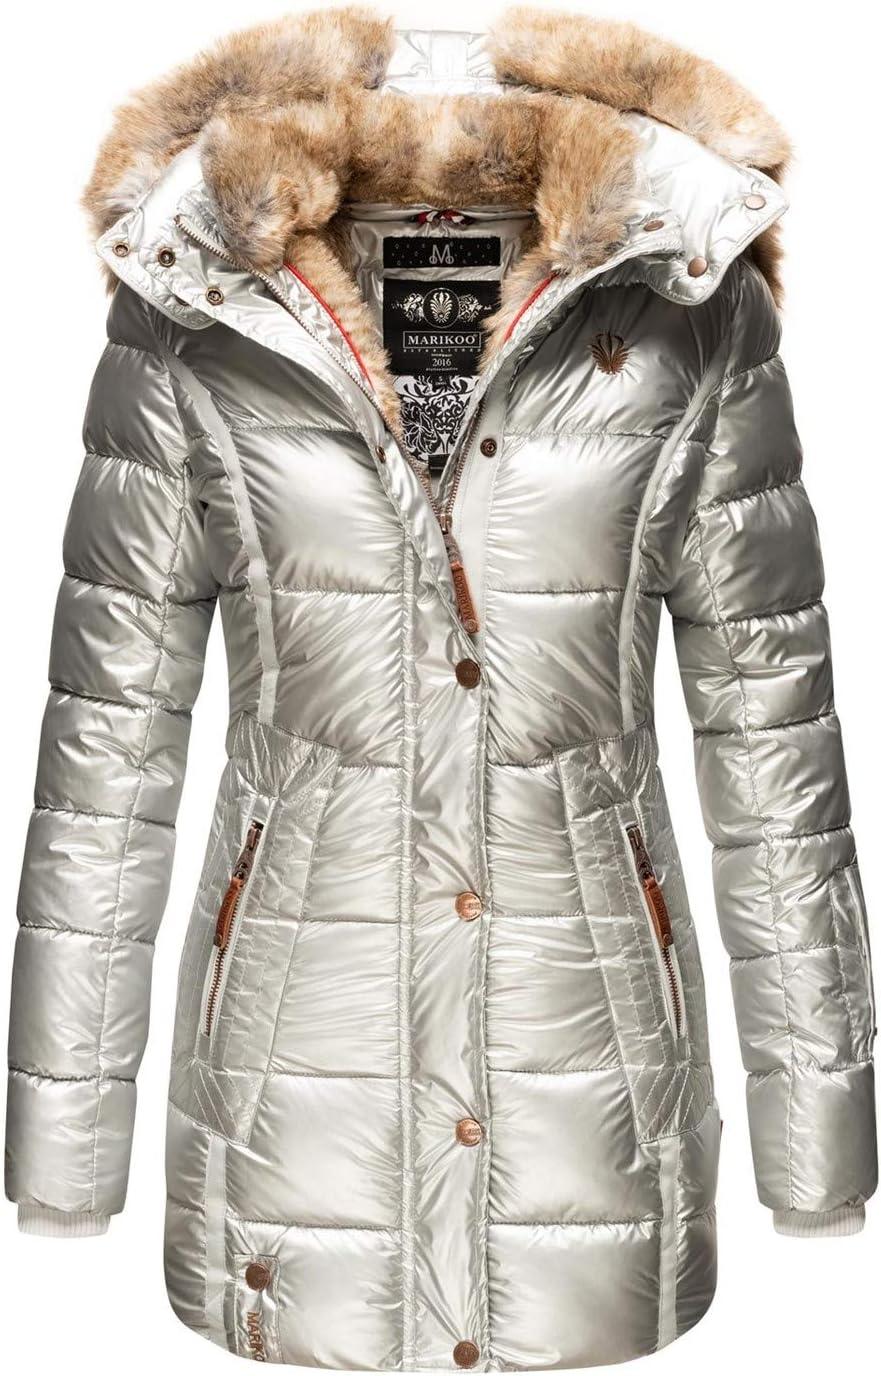 Marikoo B817 Winterjas voor dames, parka, warm gevoerde